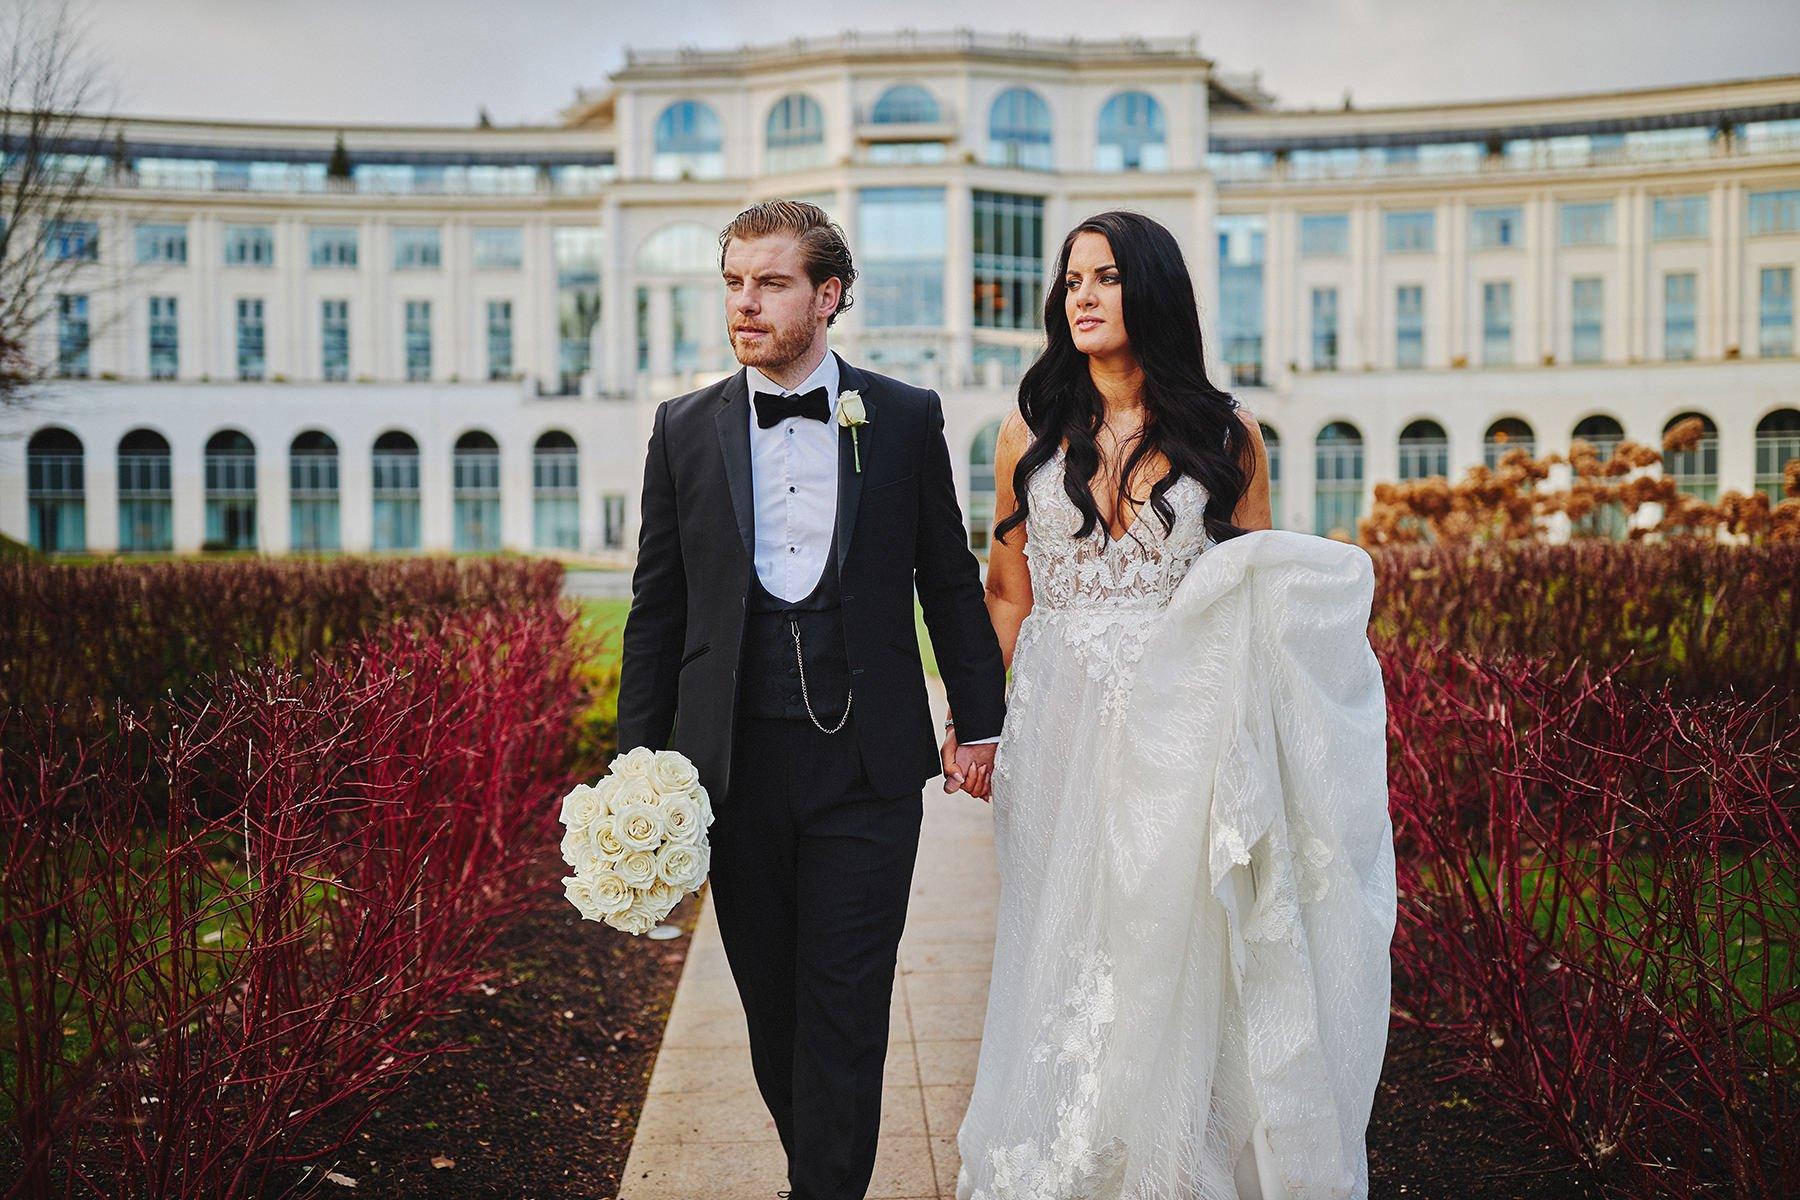 POWERSCOURT HOTEL RESORT INTIMATE WEDDING 77